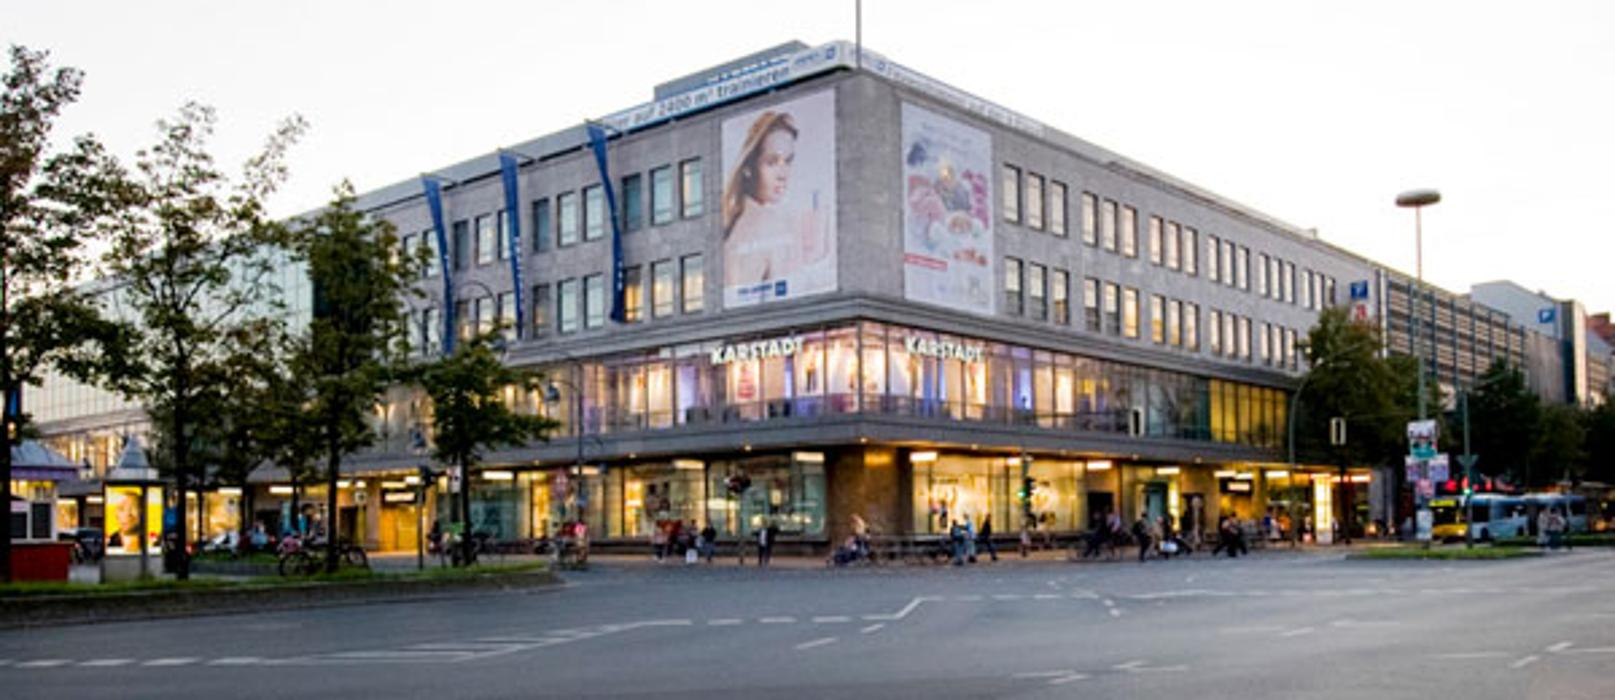 GALERIA (Karstadt) Berlin Hermannplatz Kreuzberg, Hermannplatz in Berlin